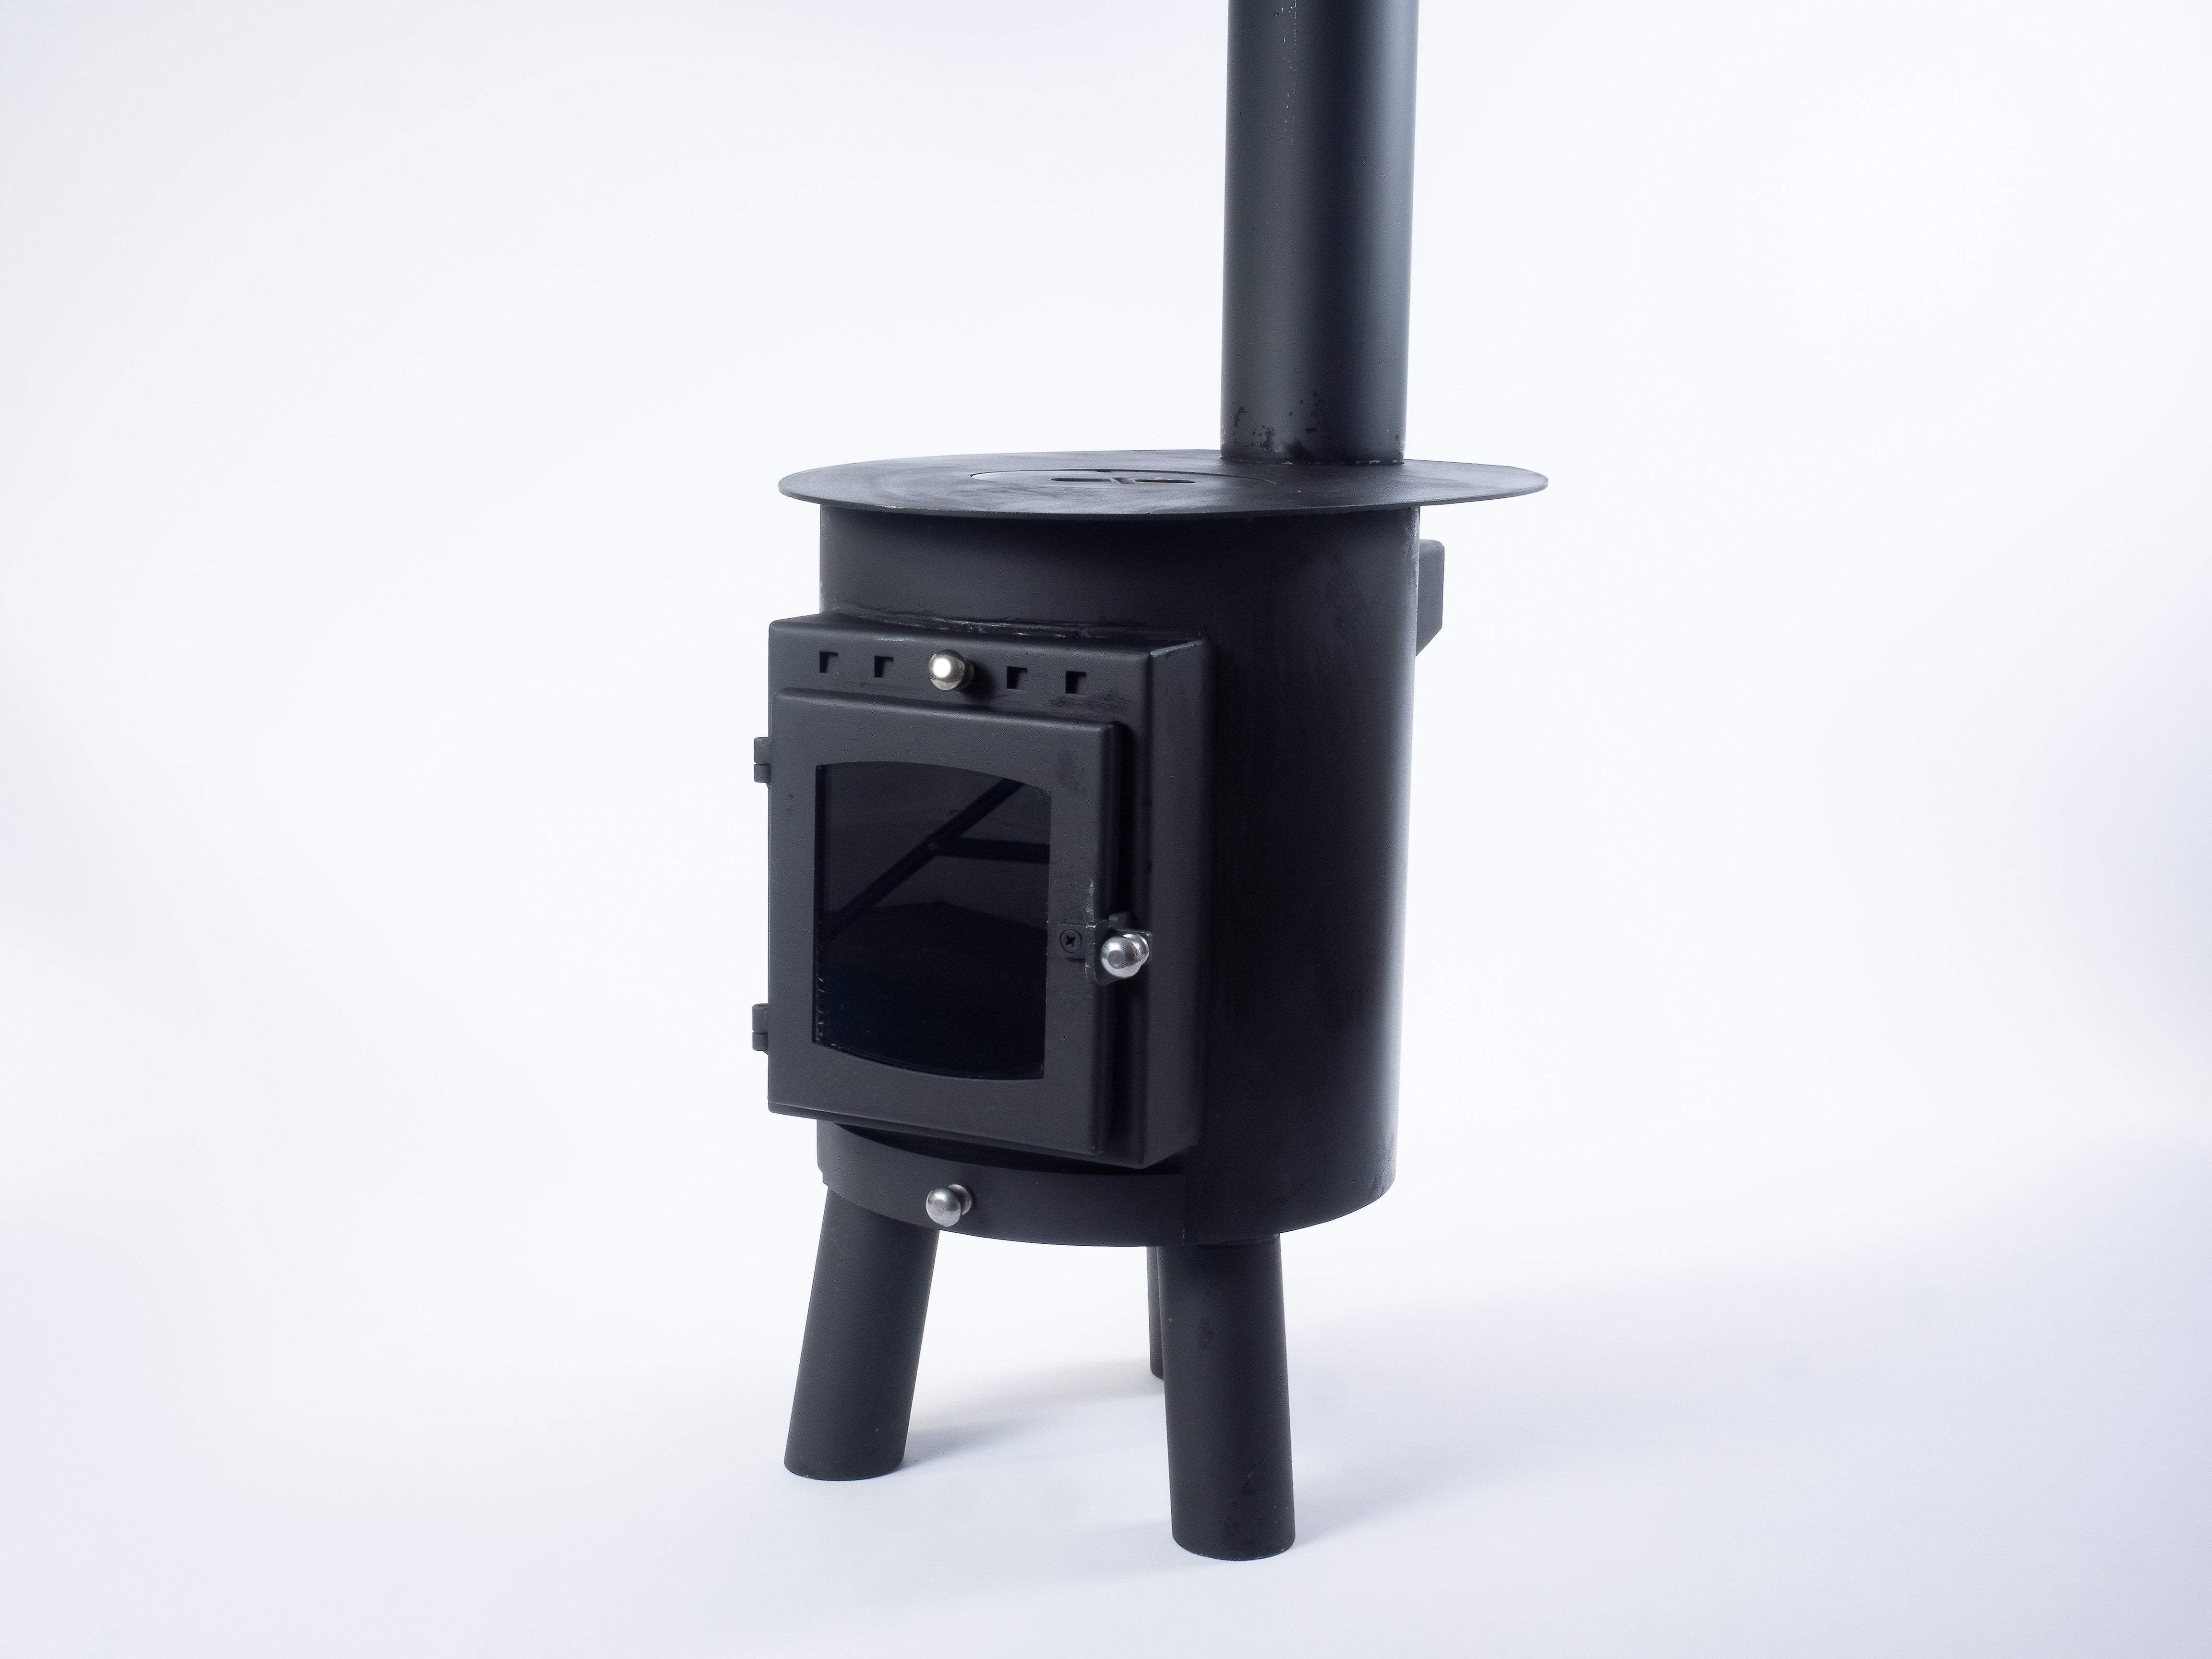 Outbacker® Hygge Woodburning Shepherd's Hut Stove